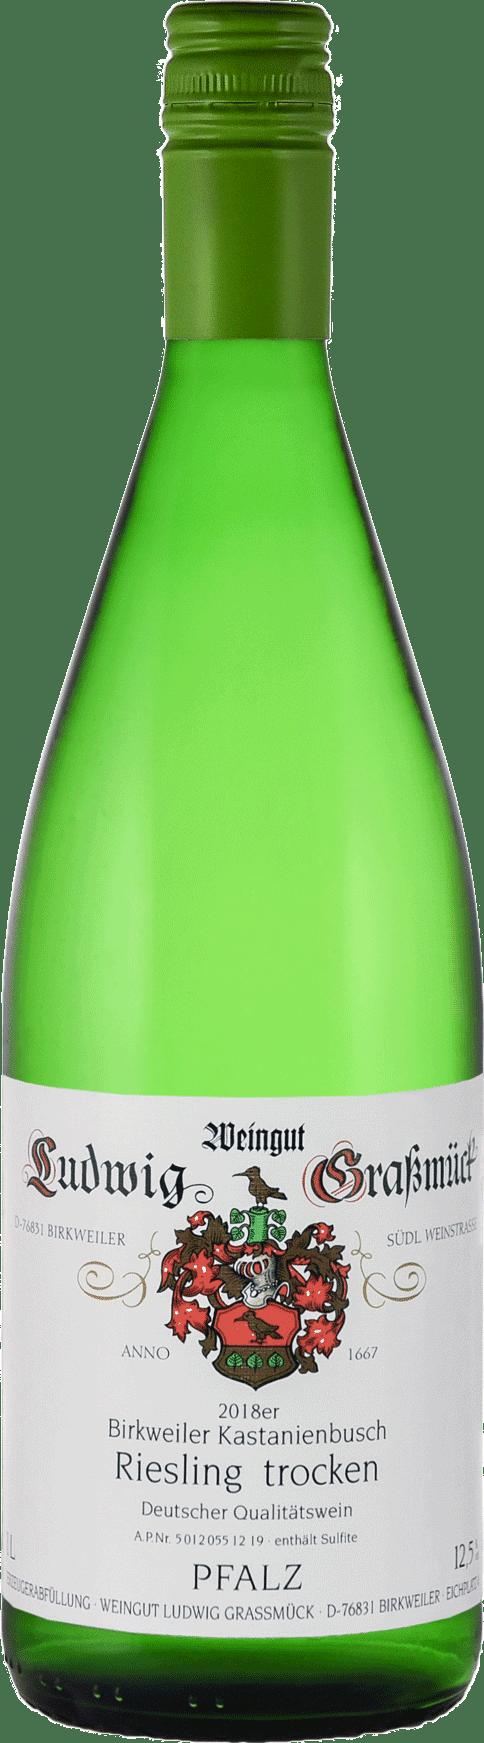 Weingut Ludwig Graßmück, Simon Graßmück, Riesling, trocken